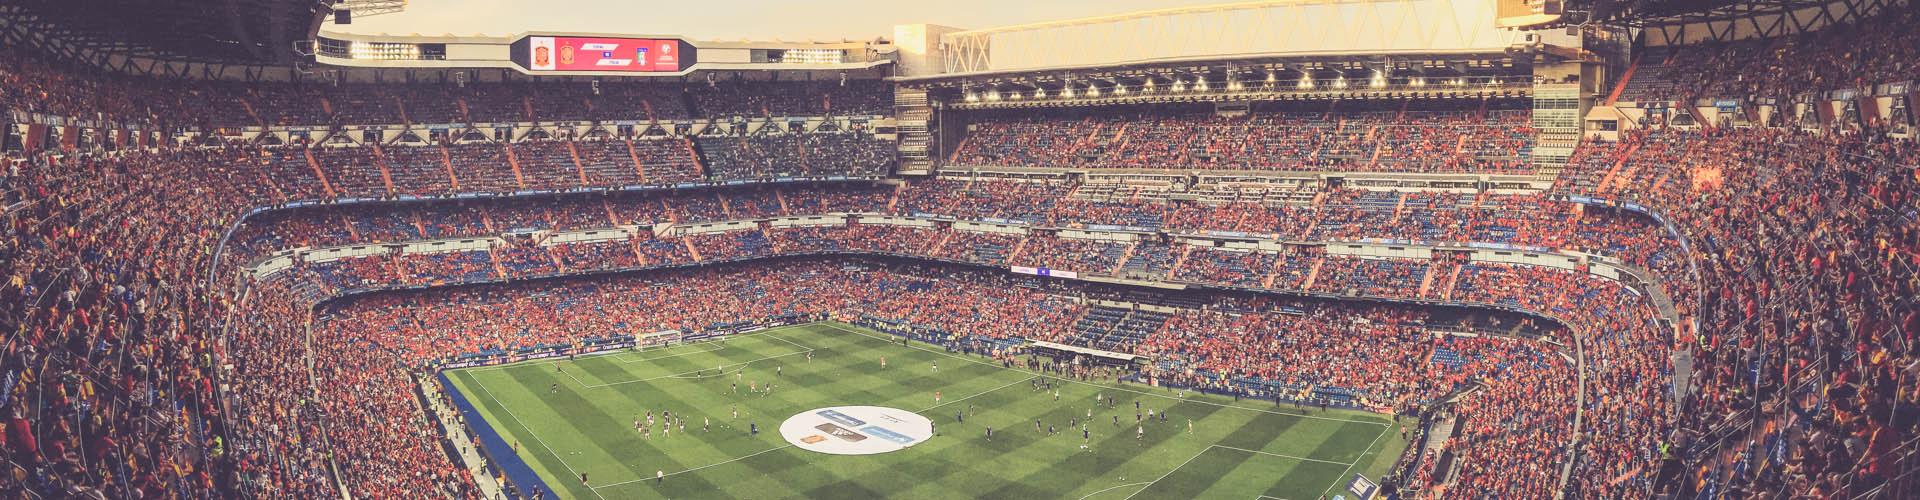 Für 10€ ins Estadio Santiago Bernabéu, Madrid - Panorama